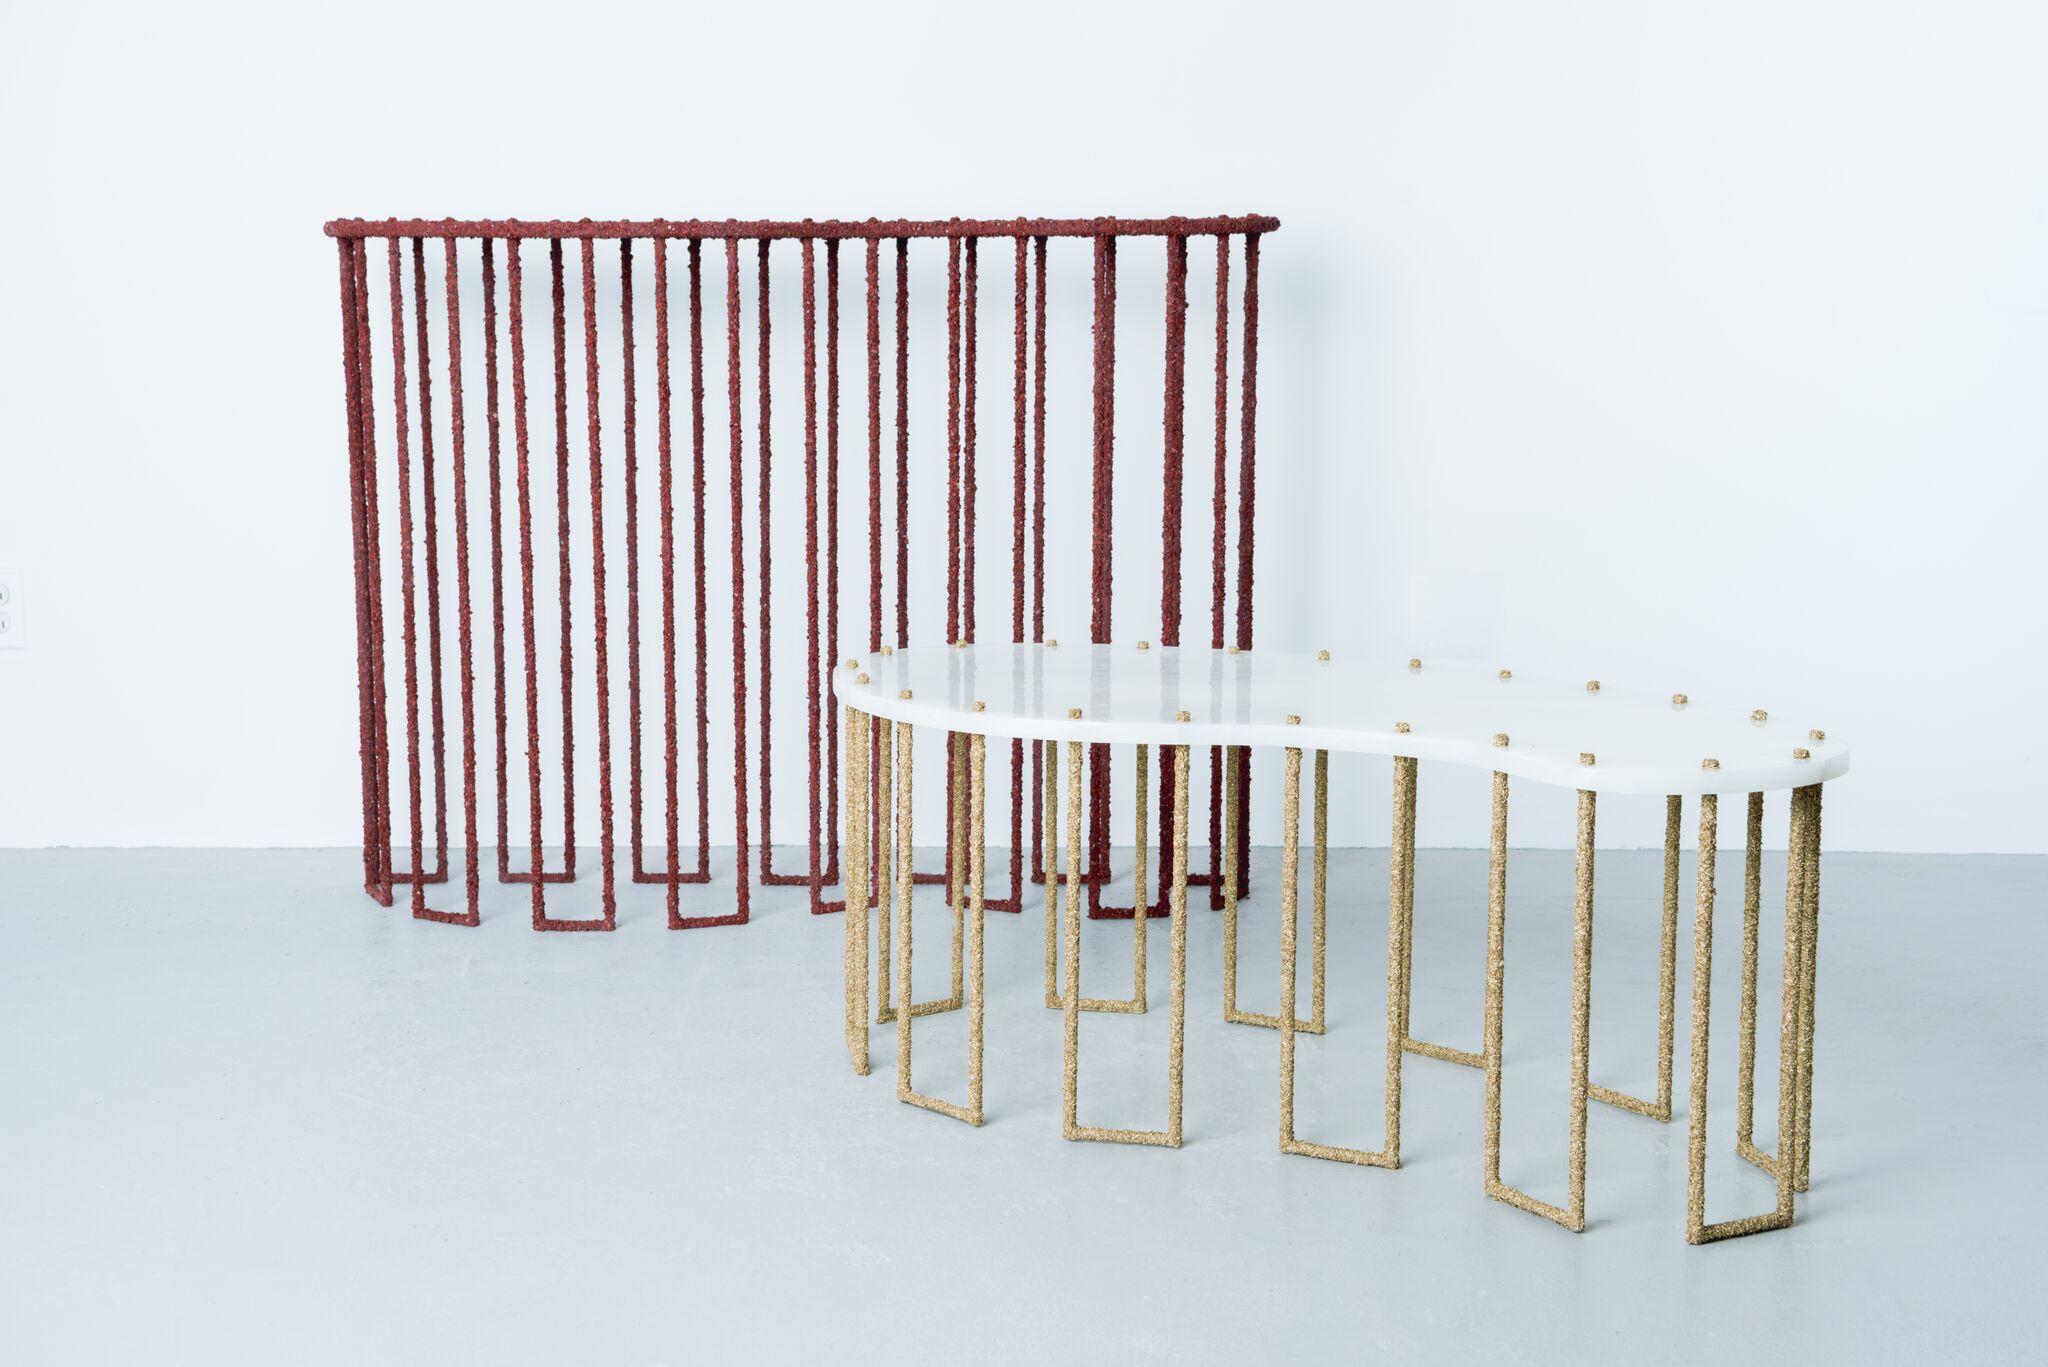 Samuel Amoia DeLorenzo Gallery